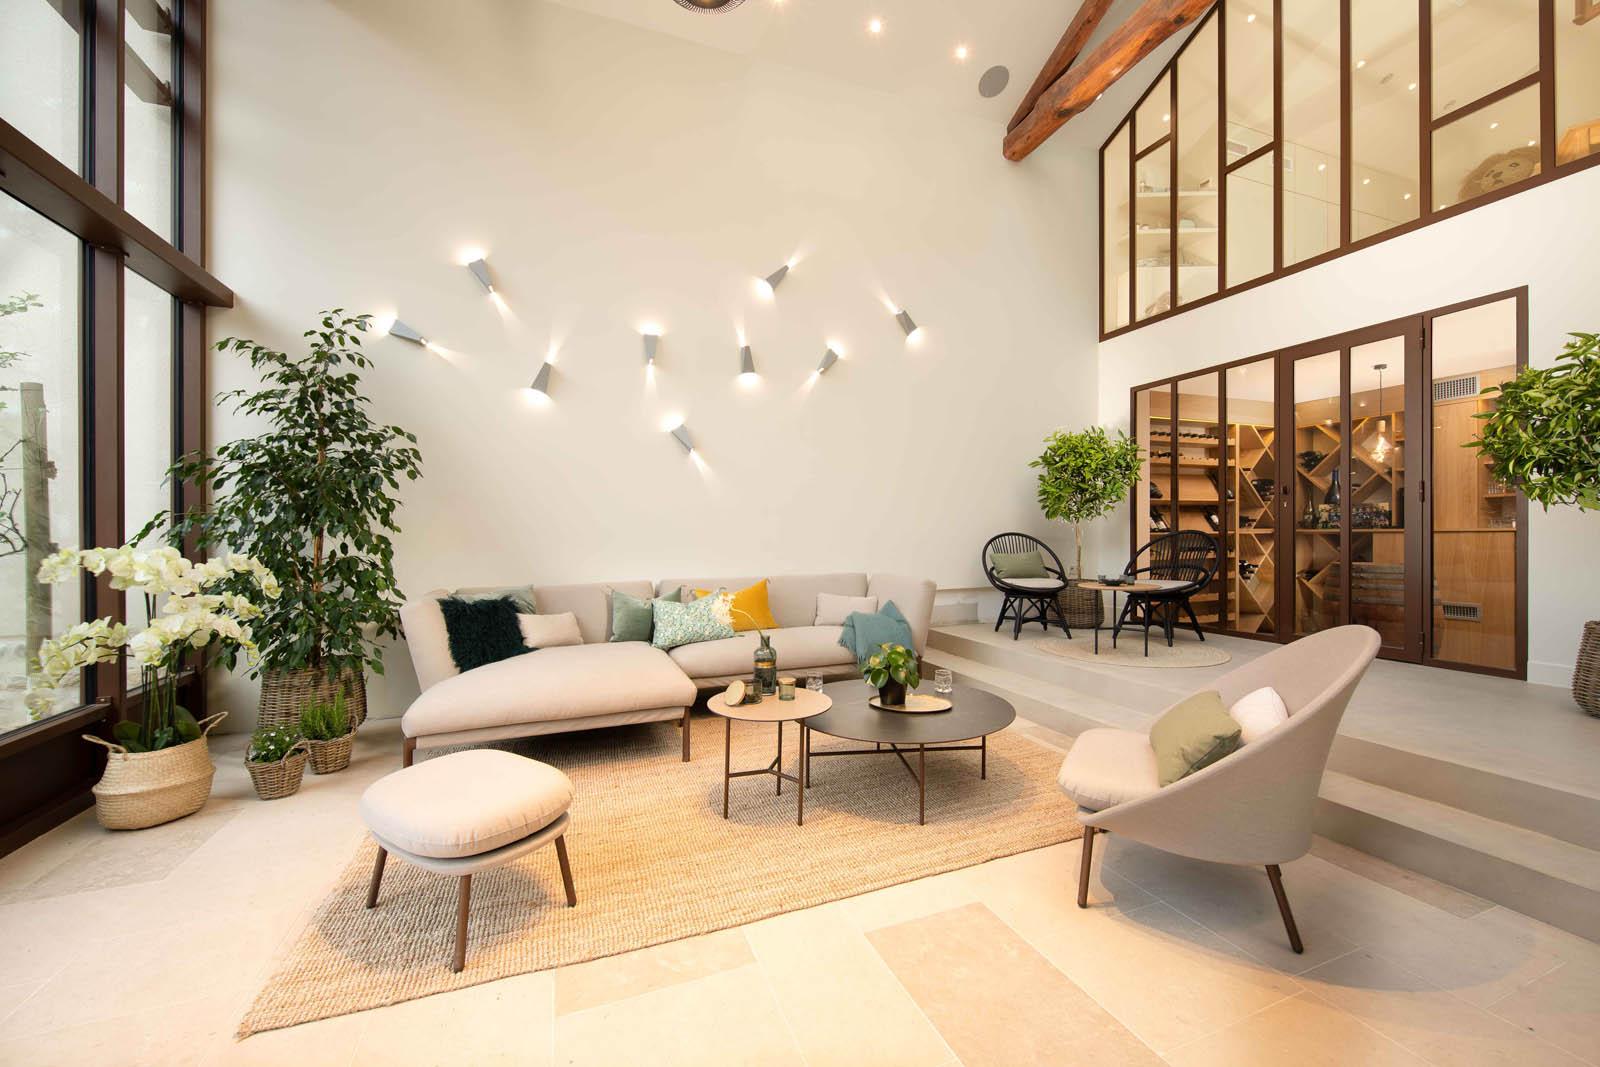 02_renovation-interieur_Invivhome-Idésia ©StudioRobinIssartel